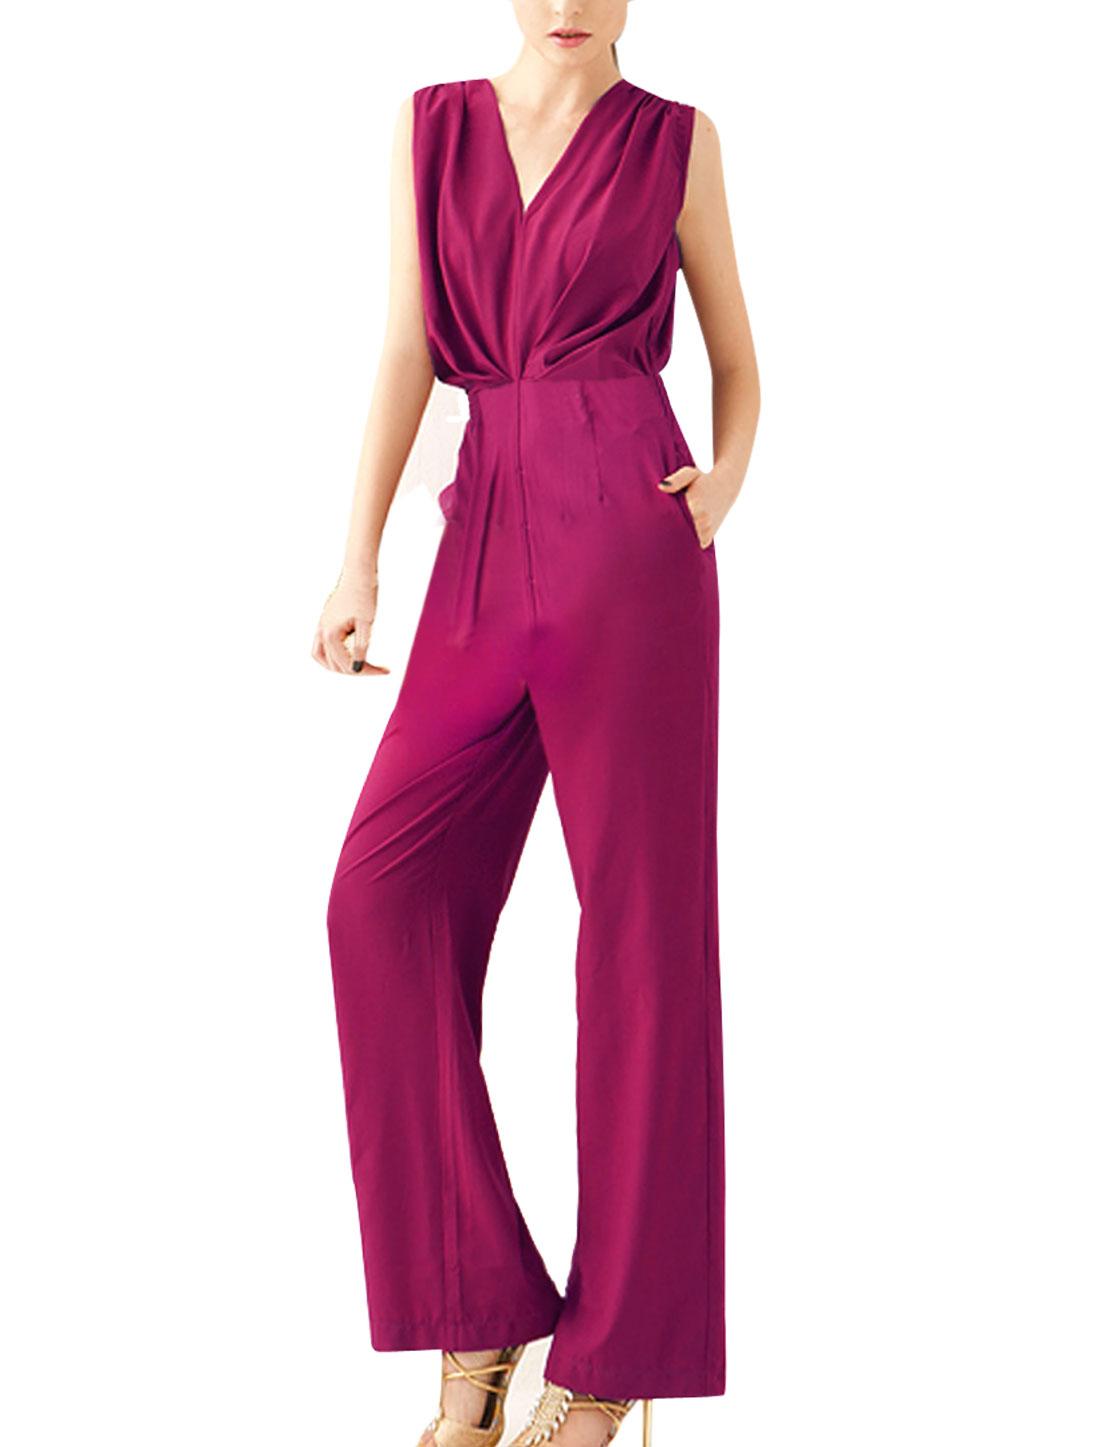 M Purple Concealed Zipper Design Solid Color Sleeveless Women Jumpsuit